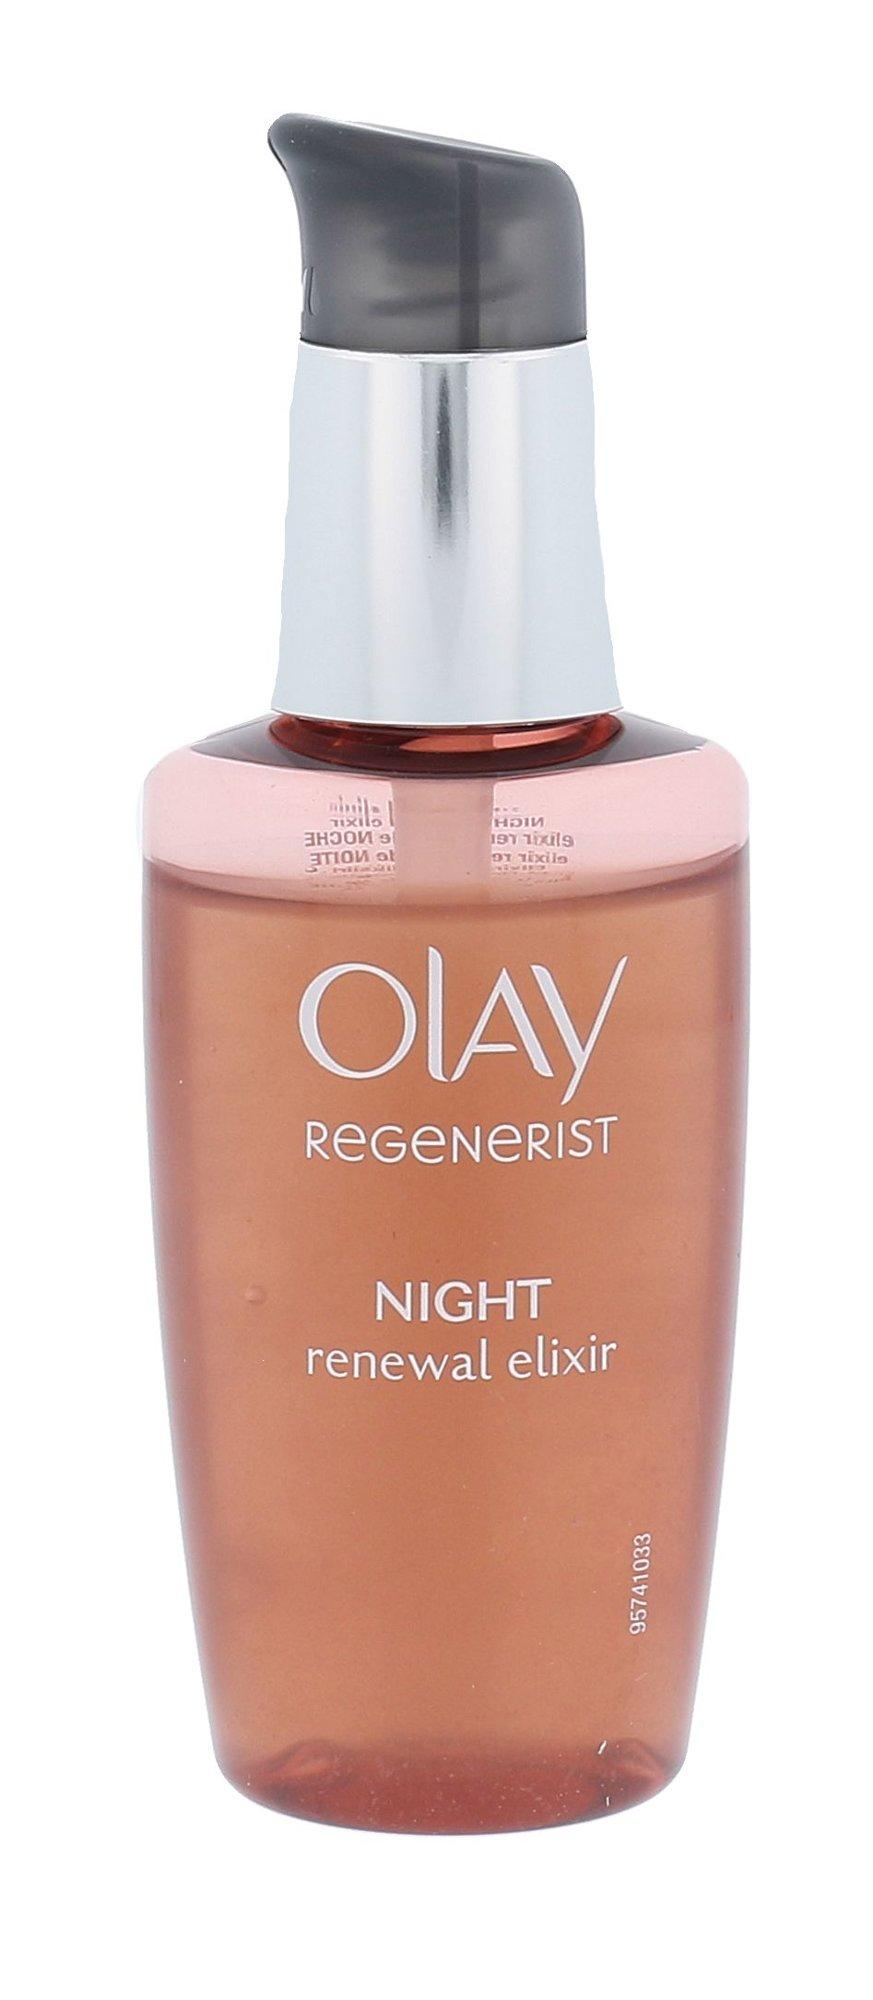 Olay Regenerist Cosmetic 50ml  Night Renewal Elixir